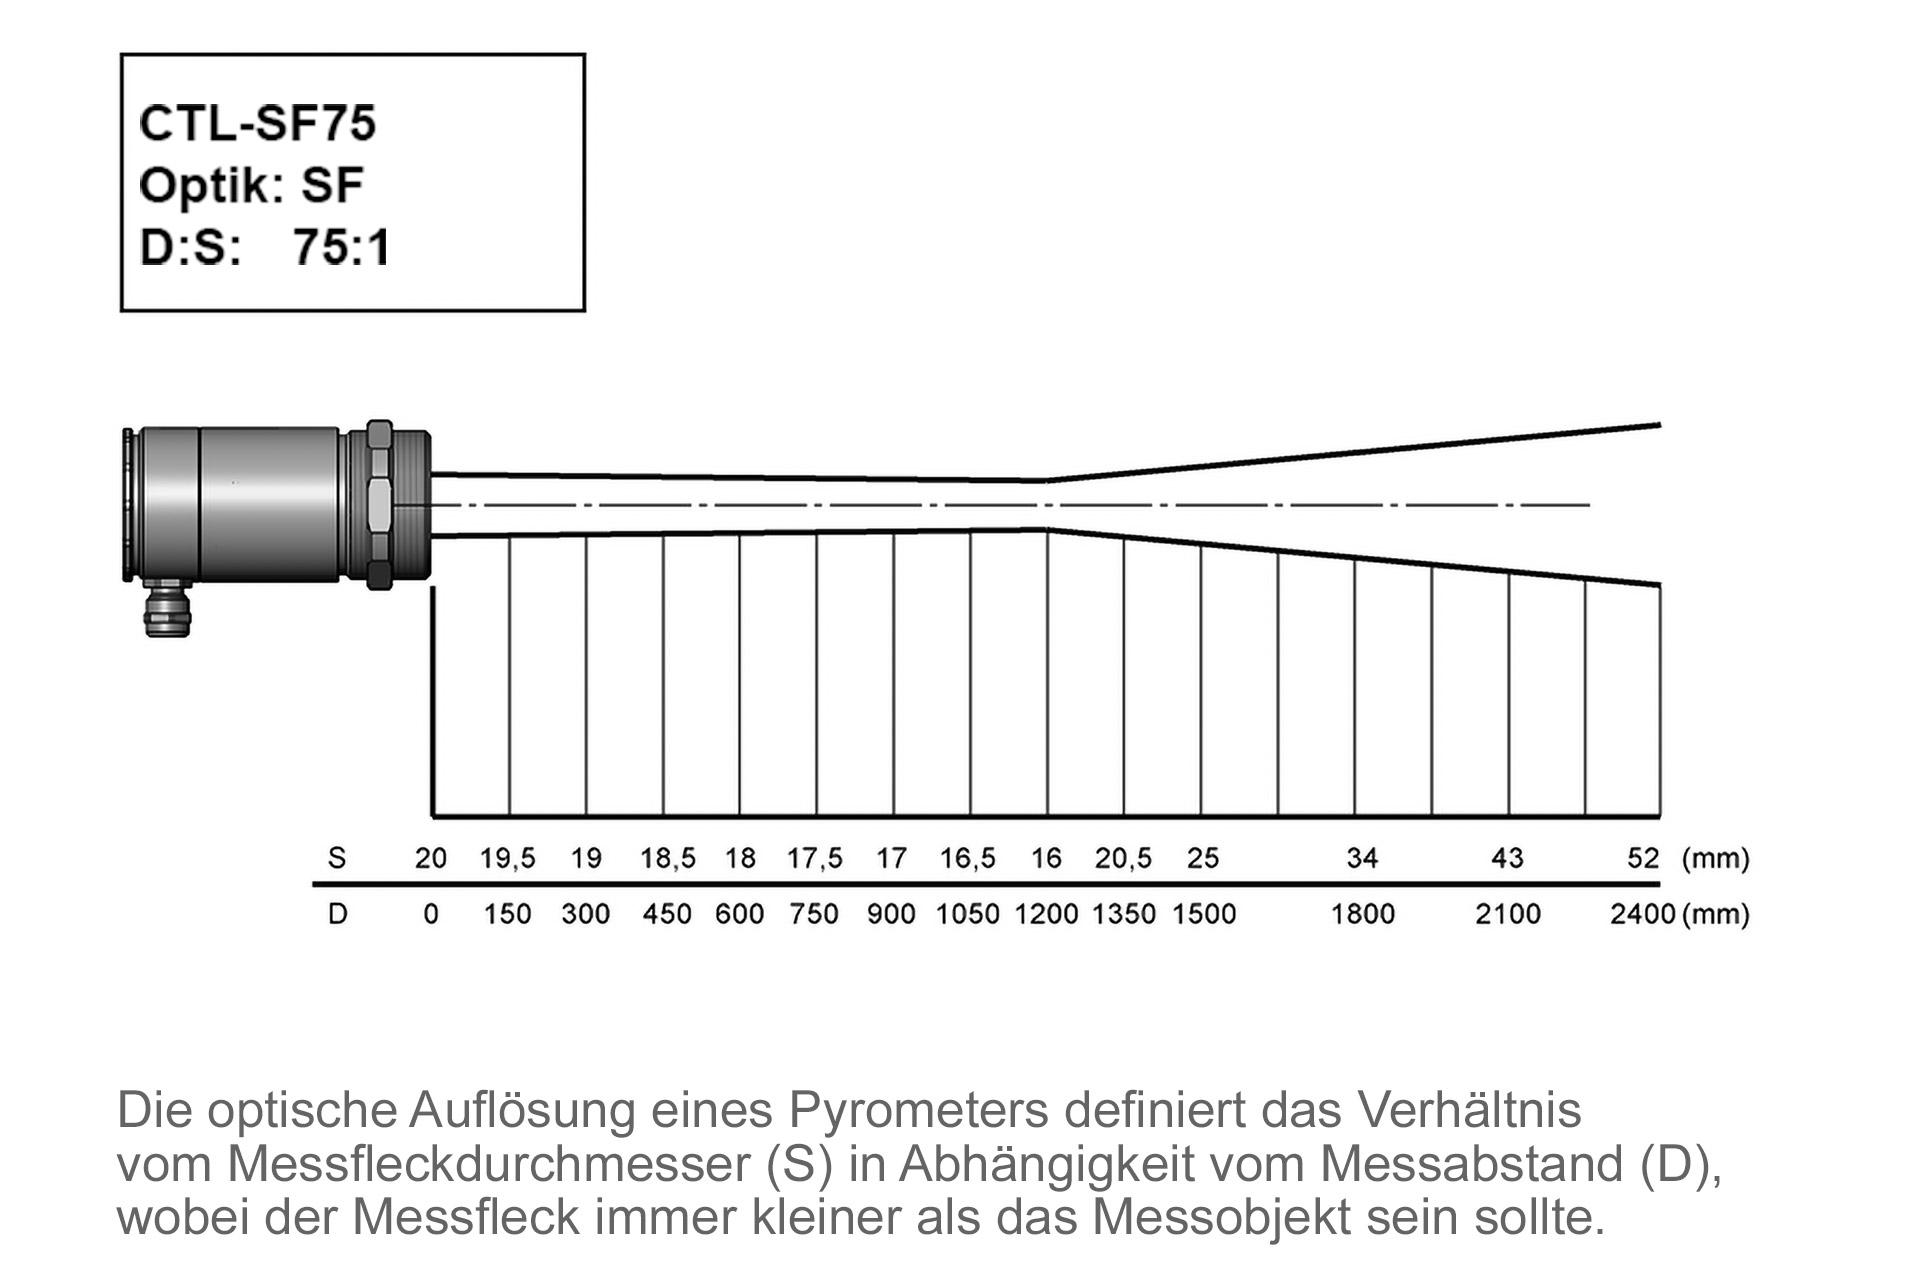 Hochleistungs-Pyrometer CTL-SF75-C3